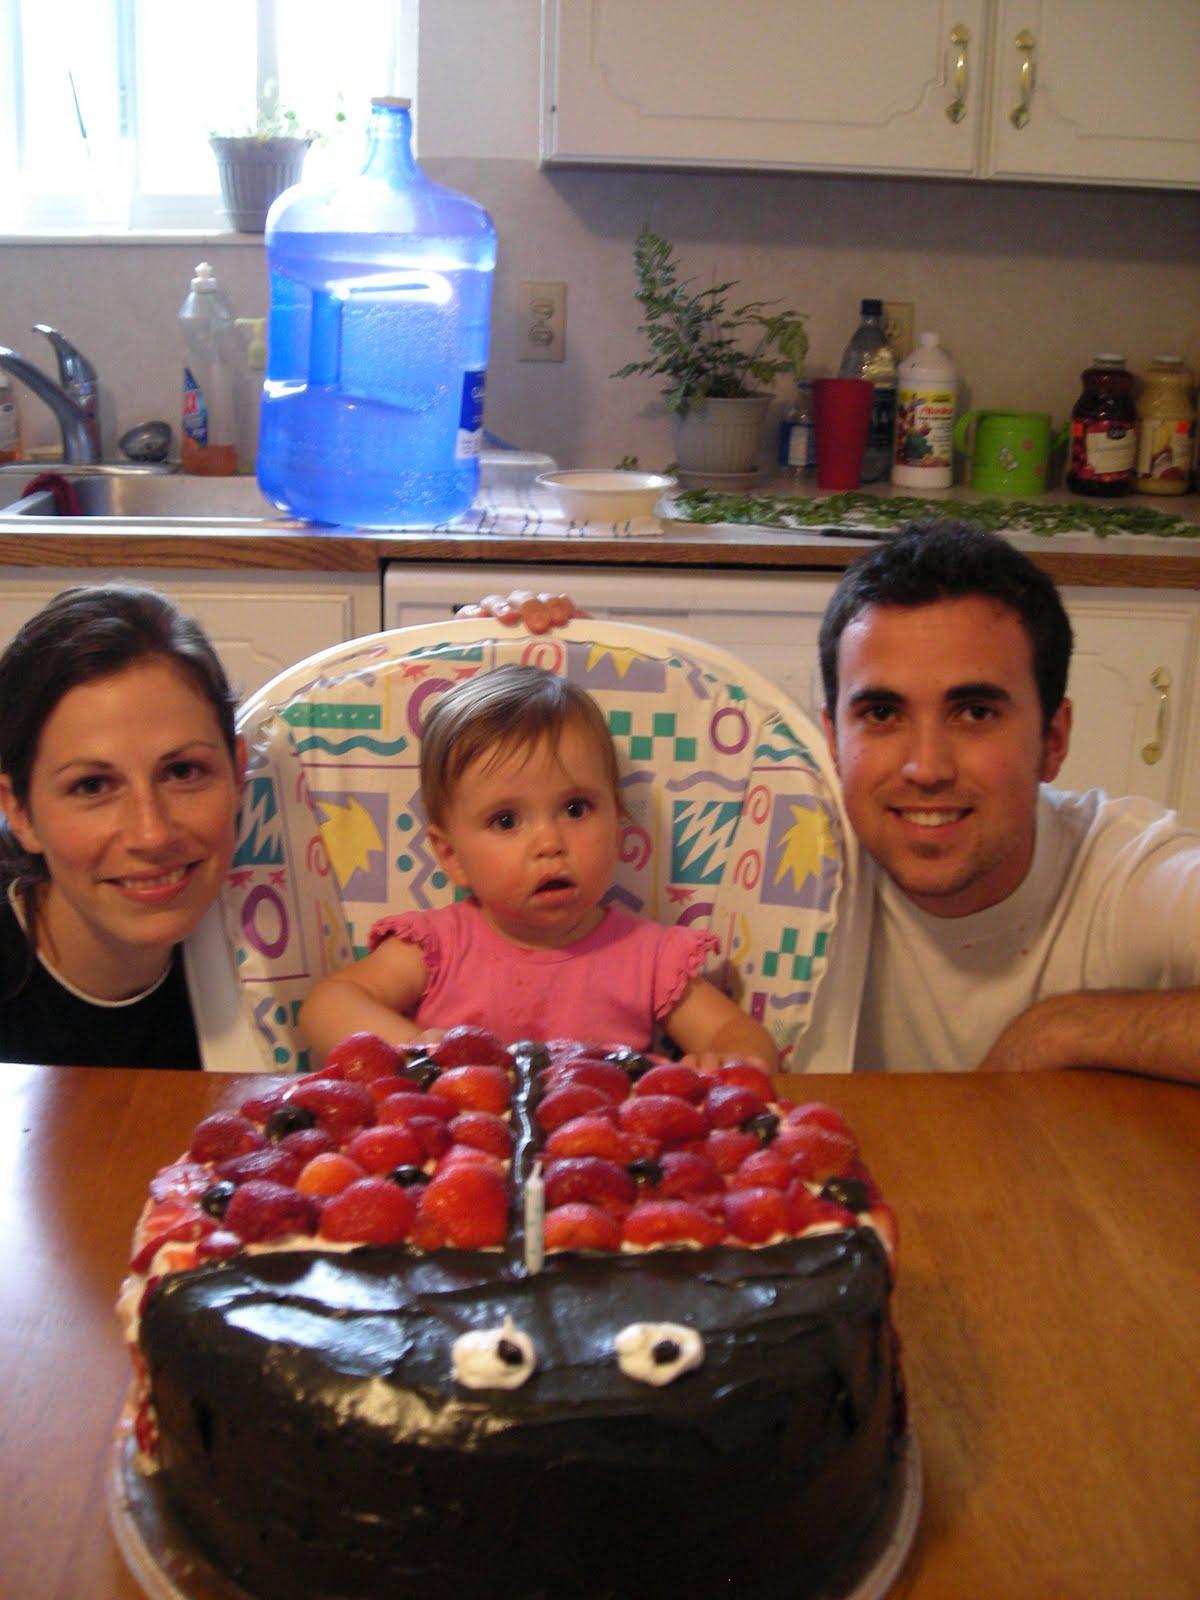 My Alternative Life Making Your Own Birthday Cake